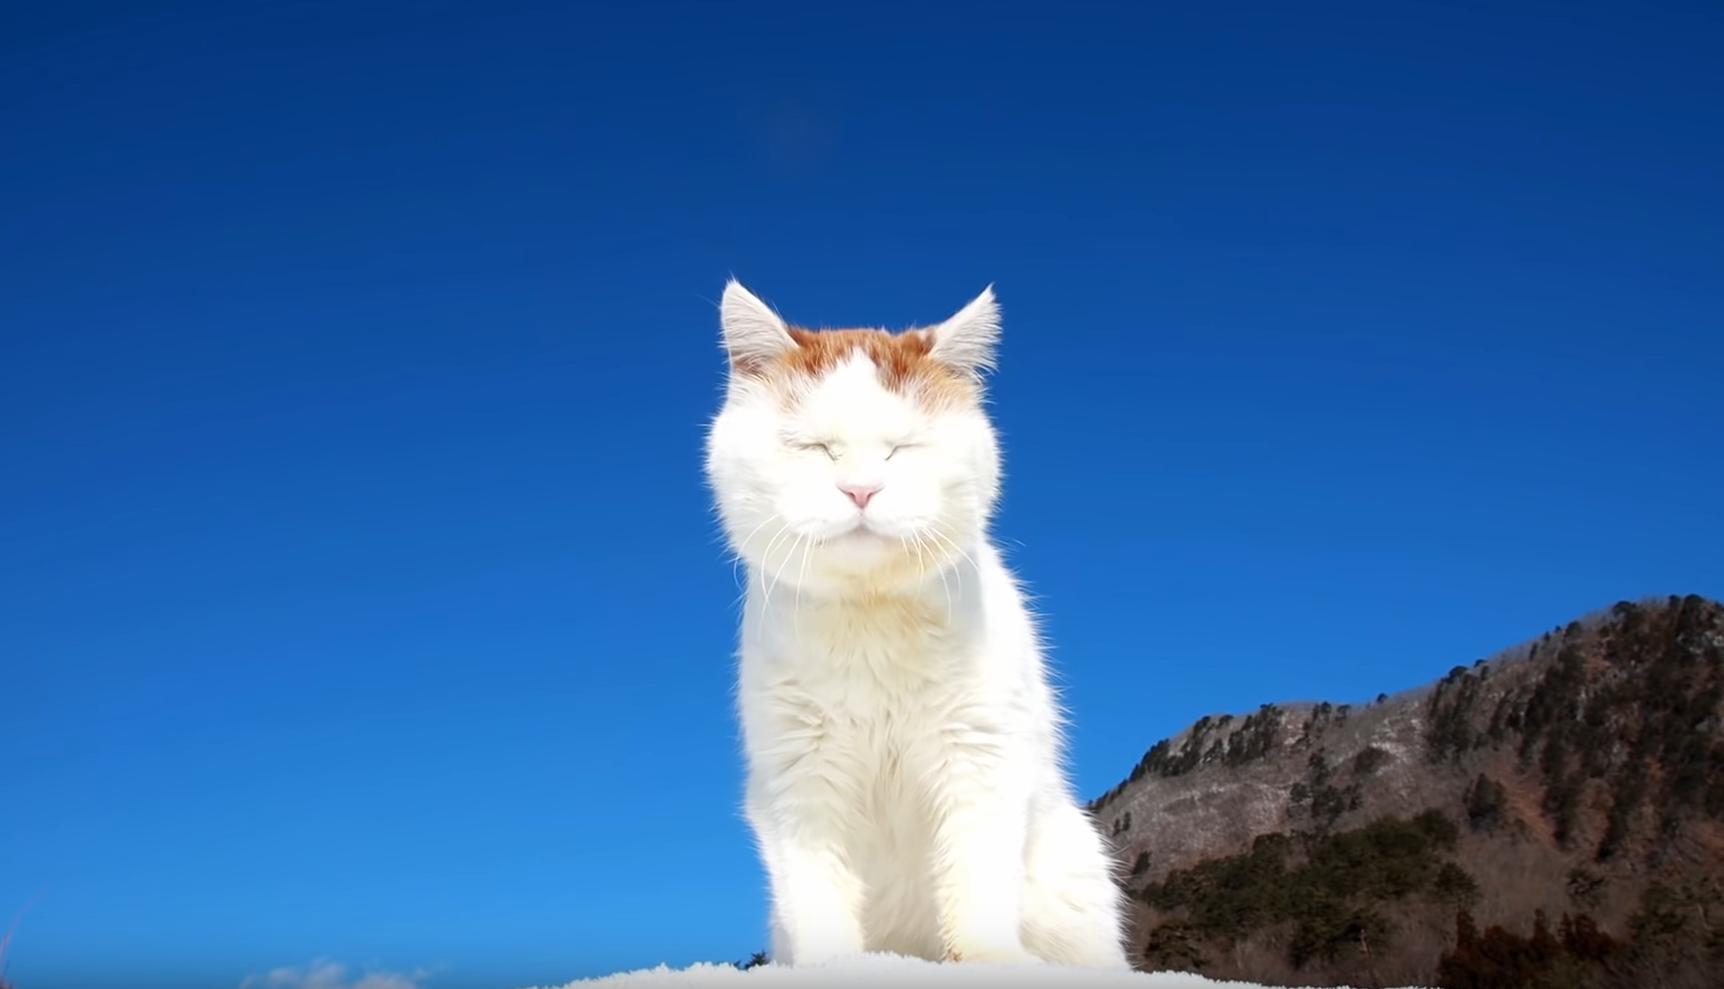 Shiro And The Blue Sky